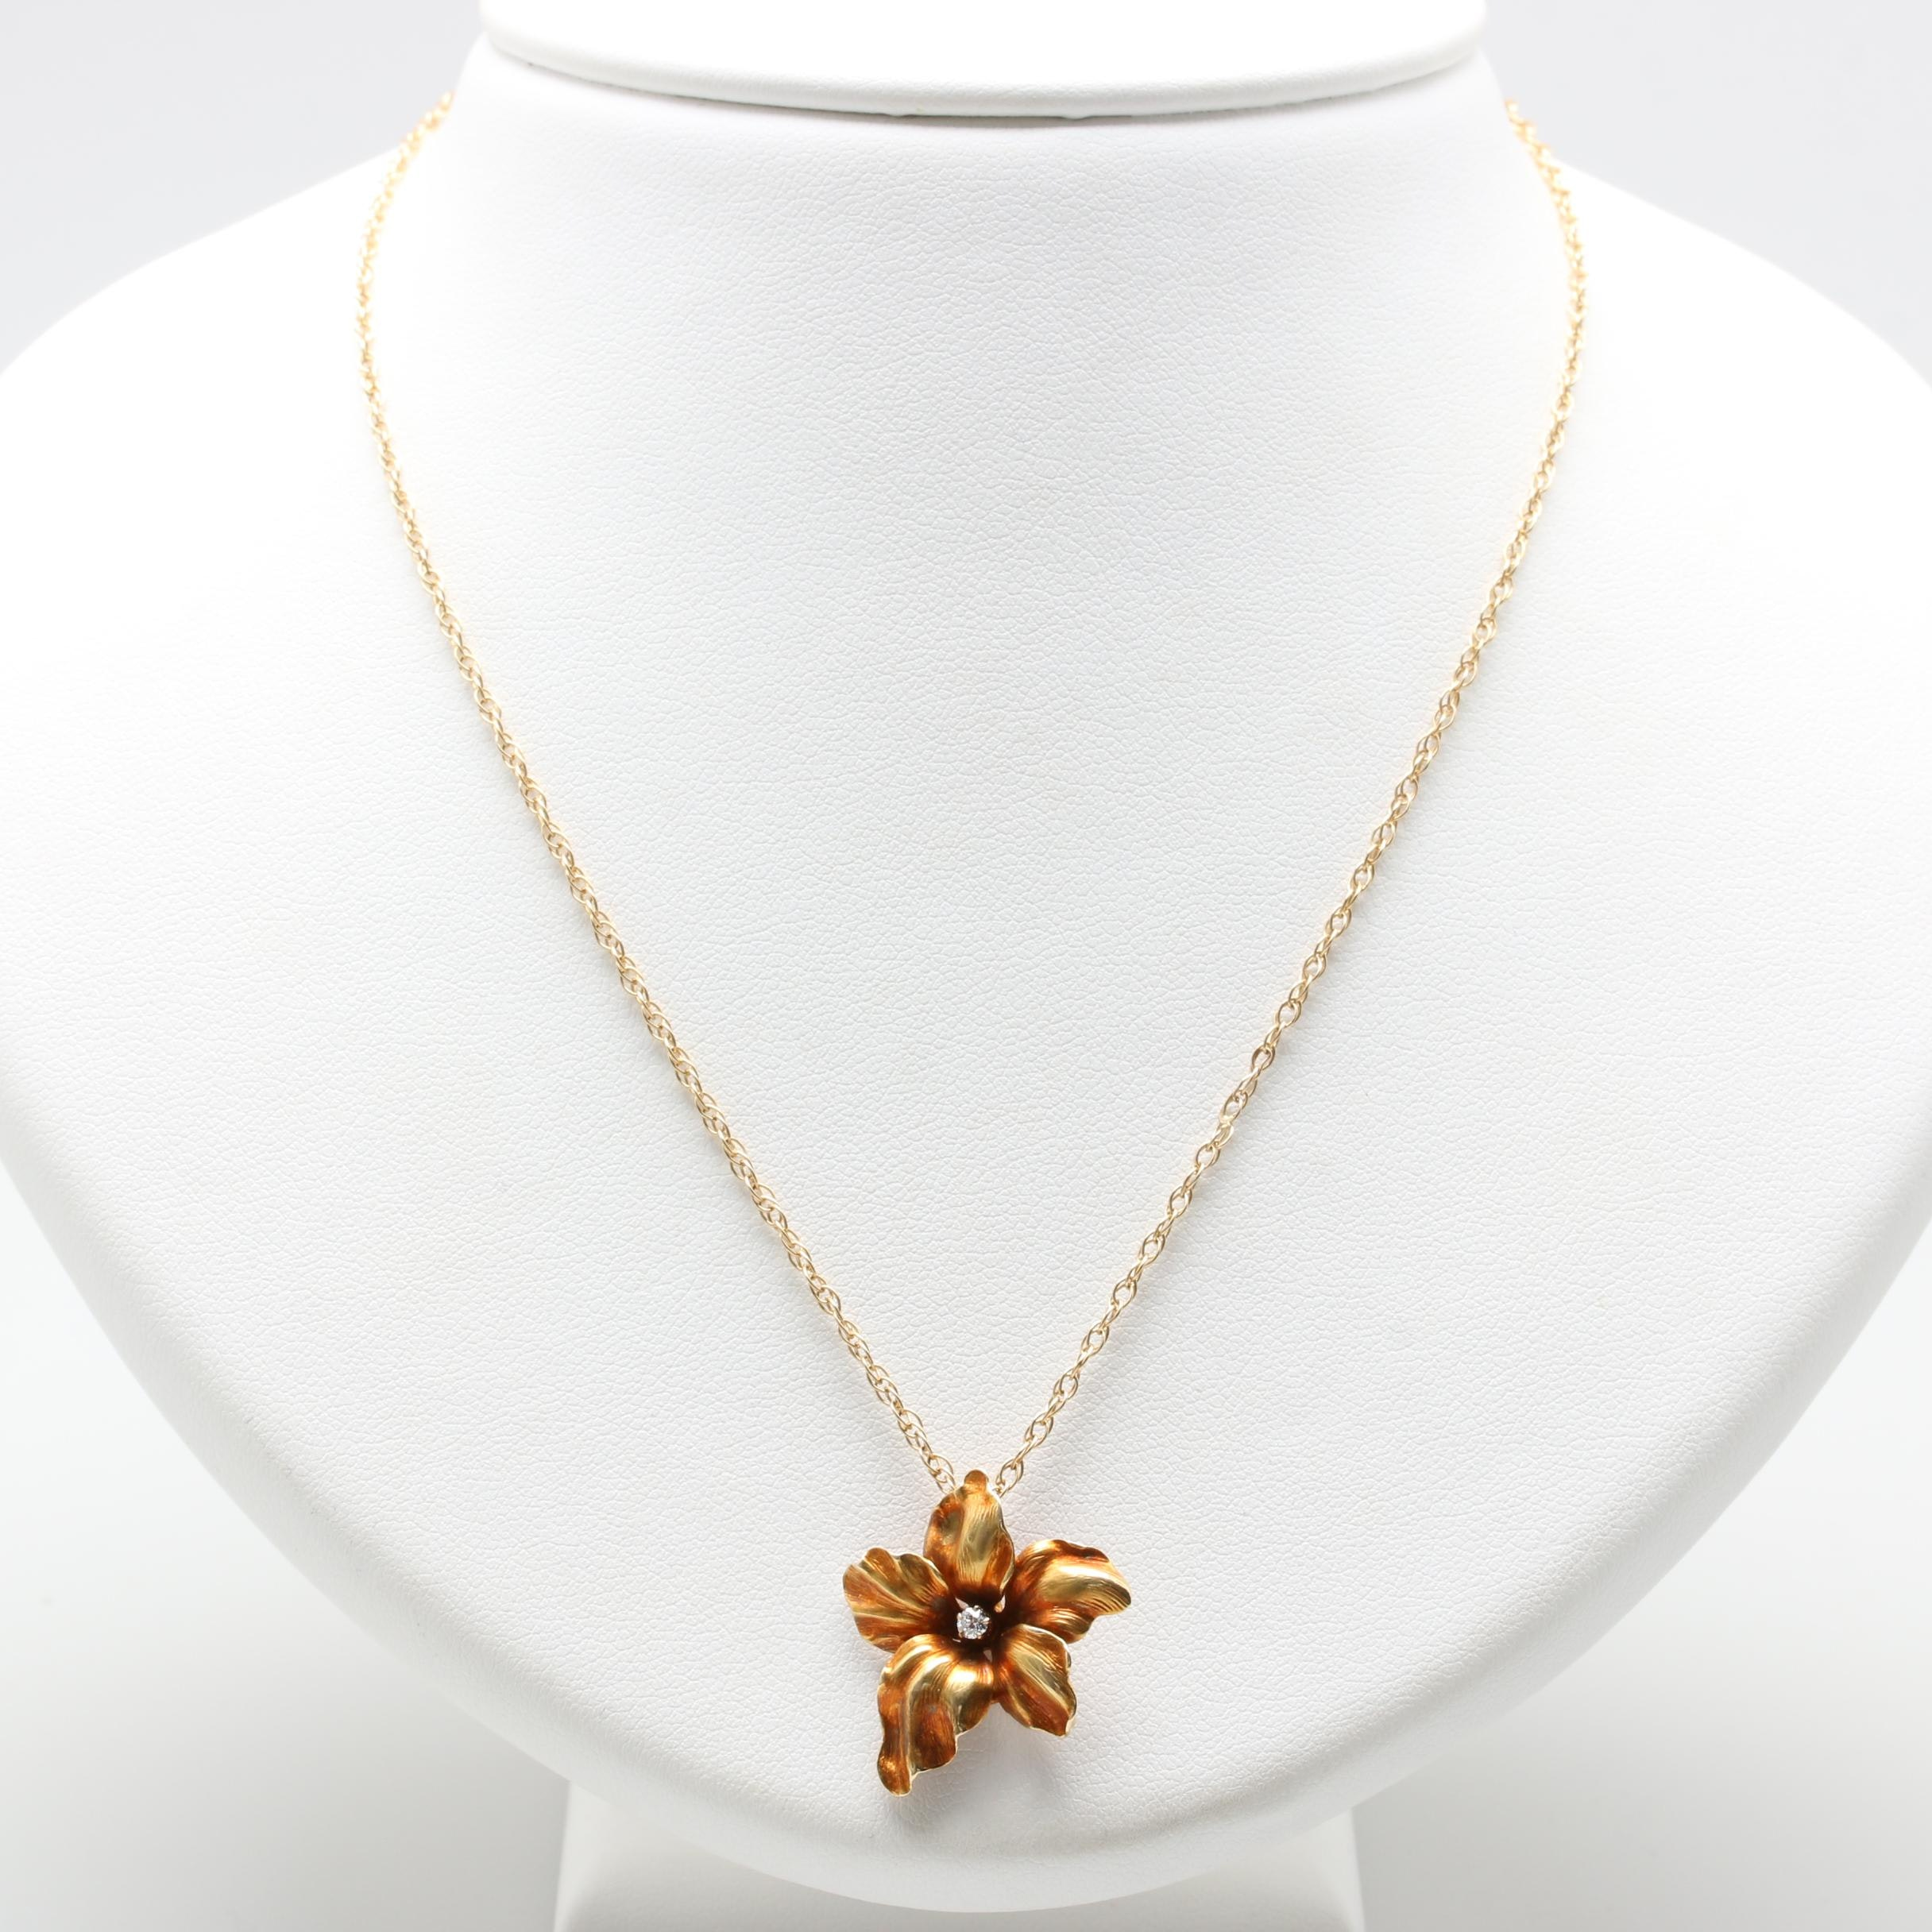 18K Yellow Gold Diamond Floral Pendant on 14K Chain